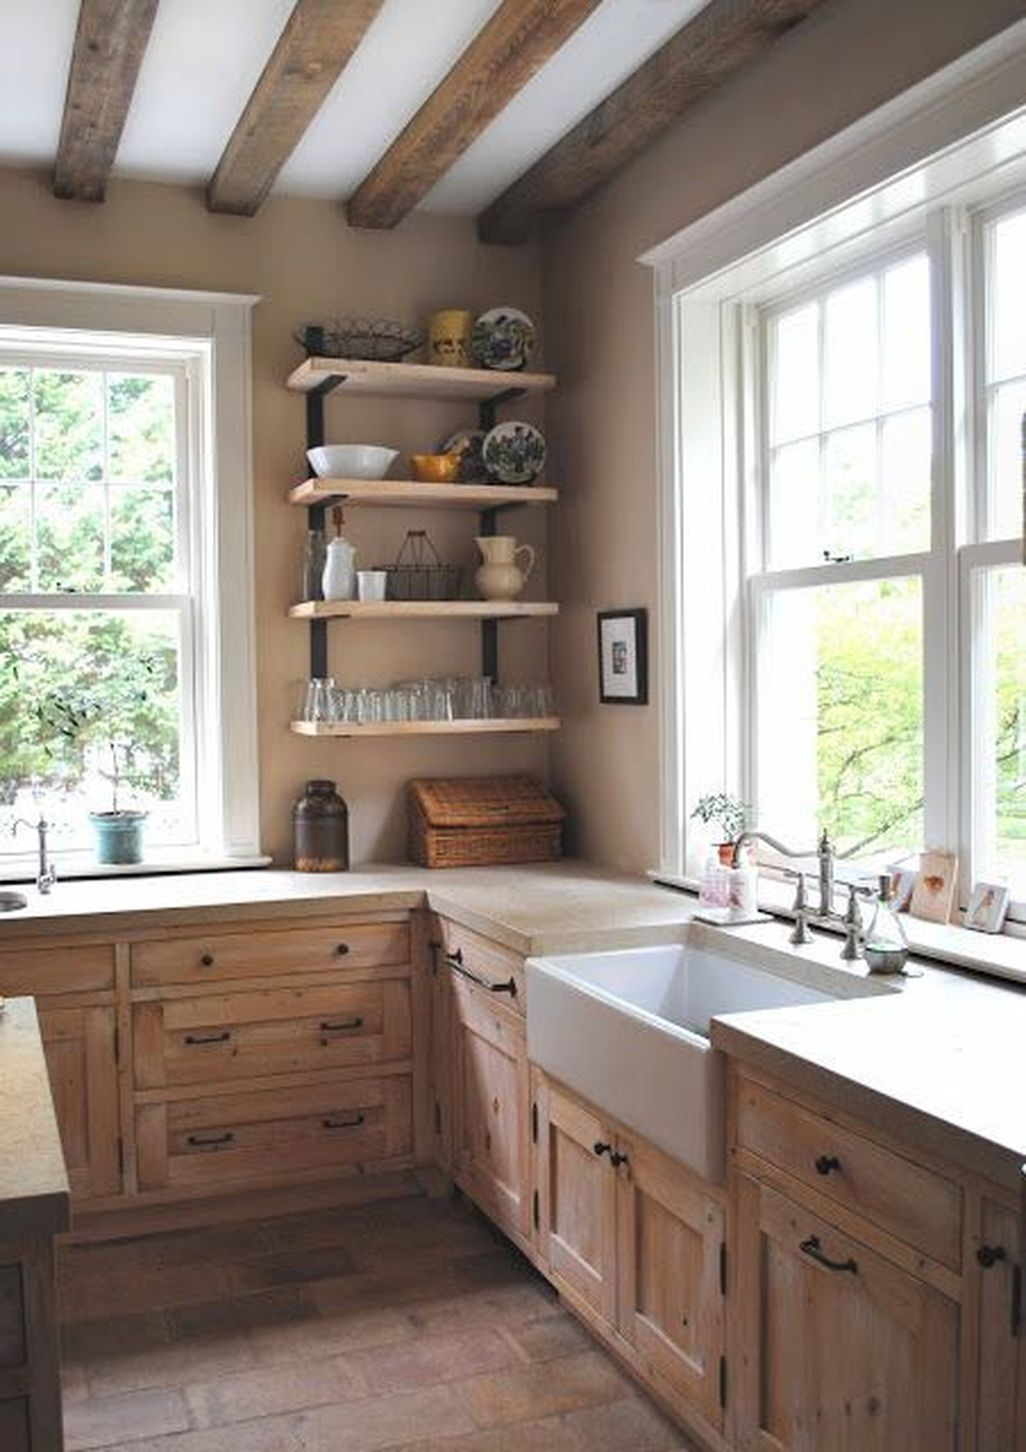 49 stylish rustic kitchen decor open shelves ideas country kitchen designs farmhouse style on kitchen decor open shelves id=81175